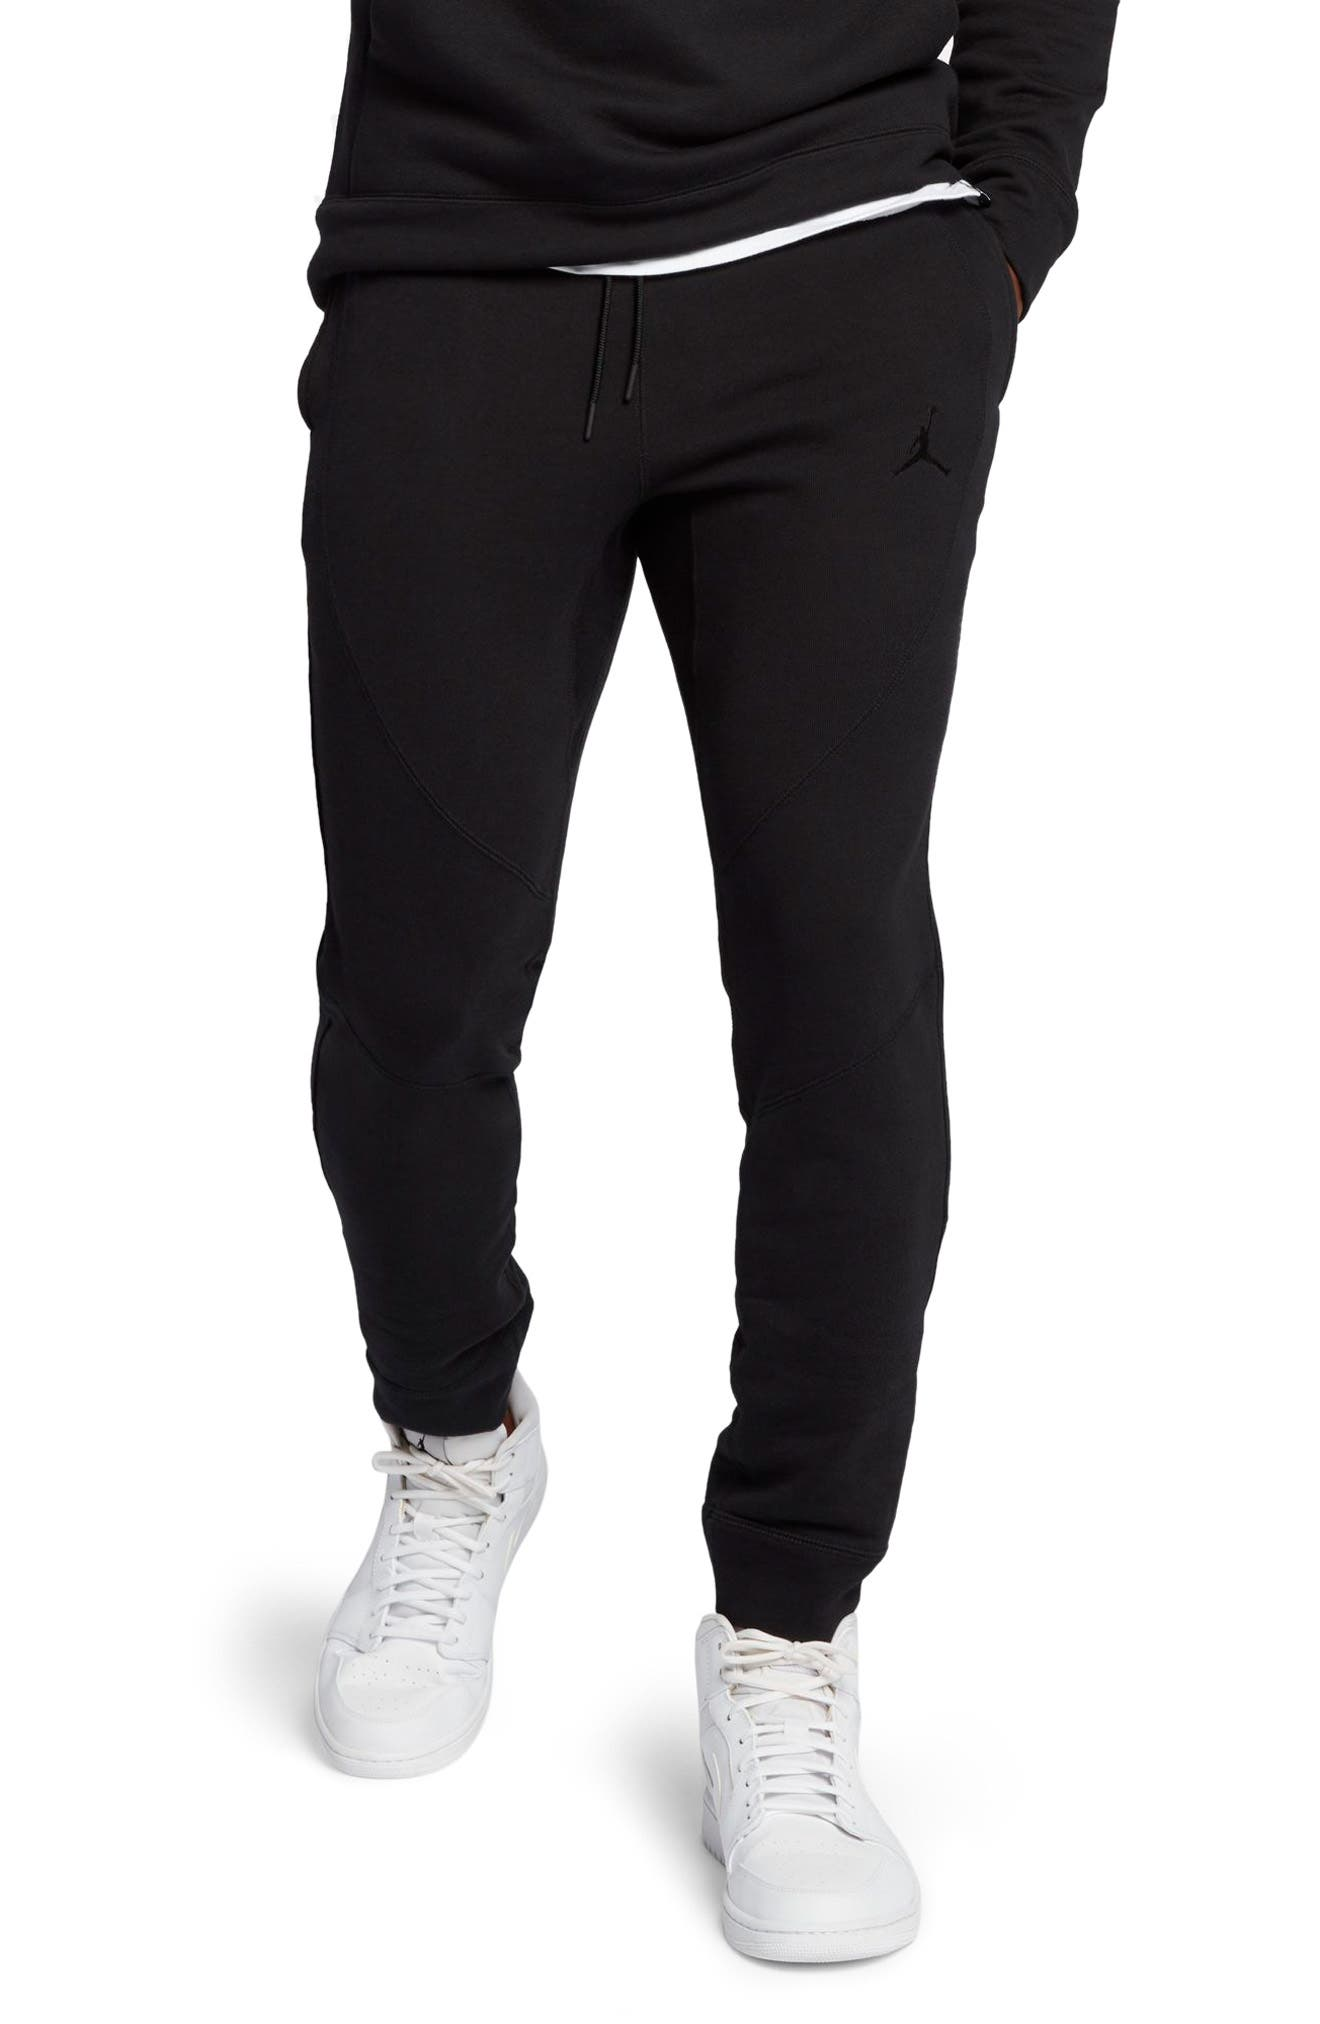 Wings Fleece Pants,                         Main,                         color, Black/ Black